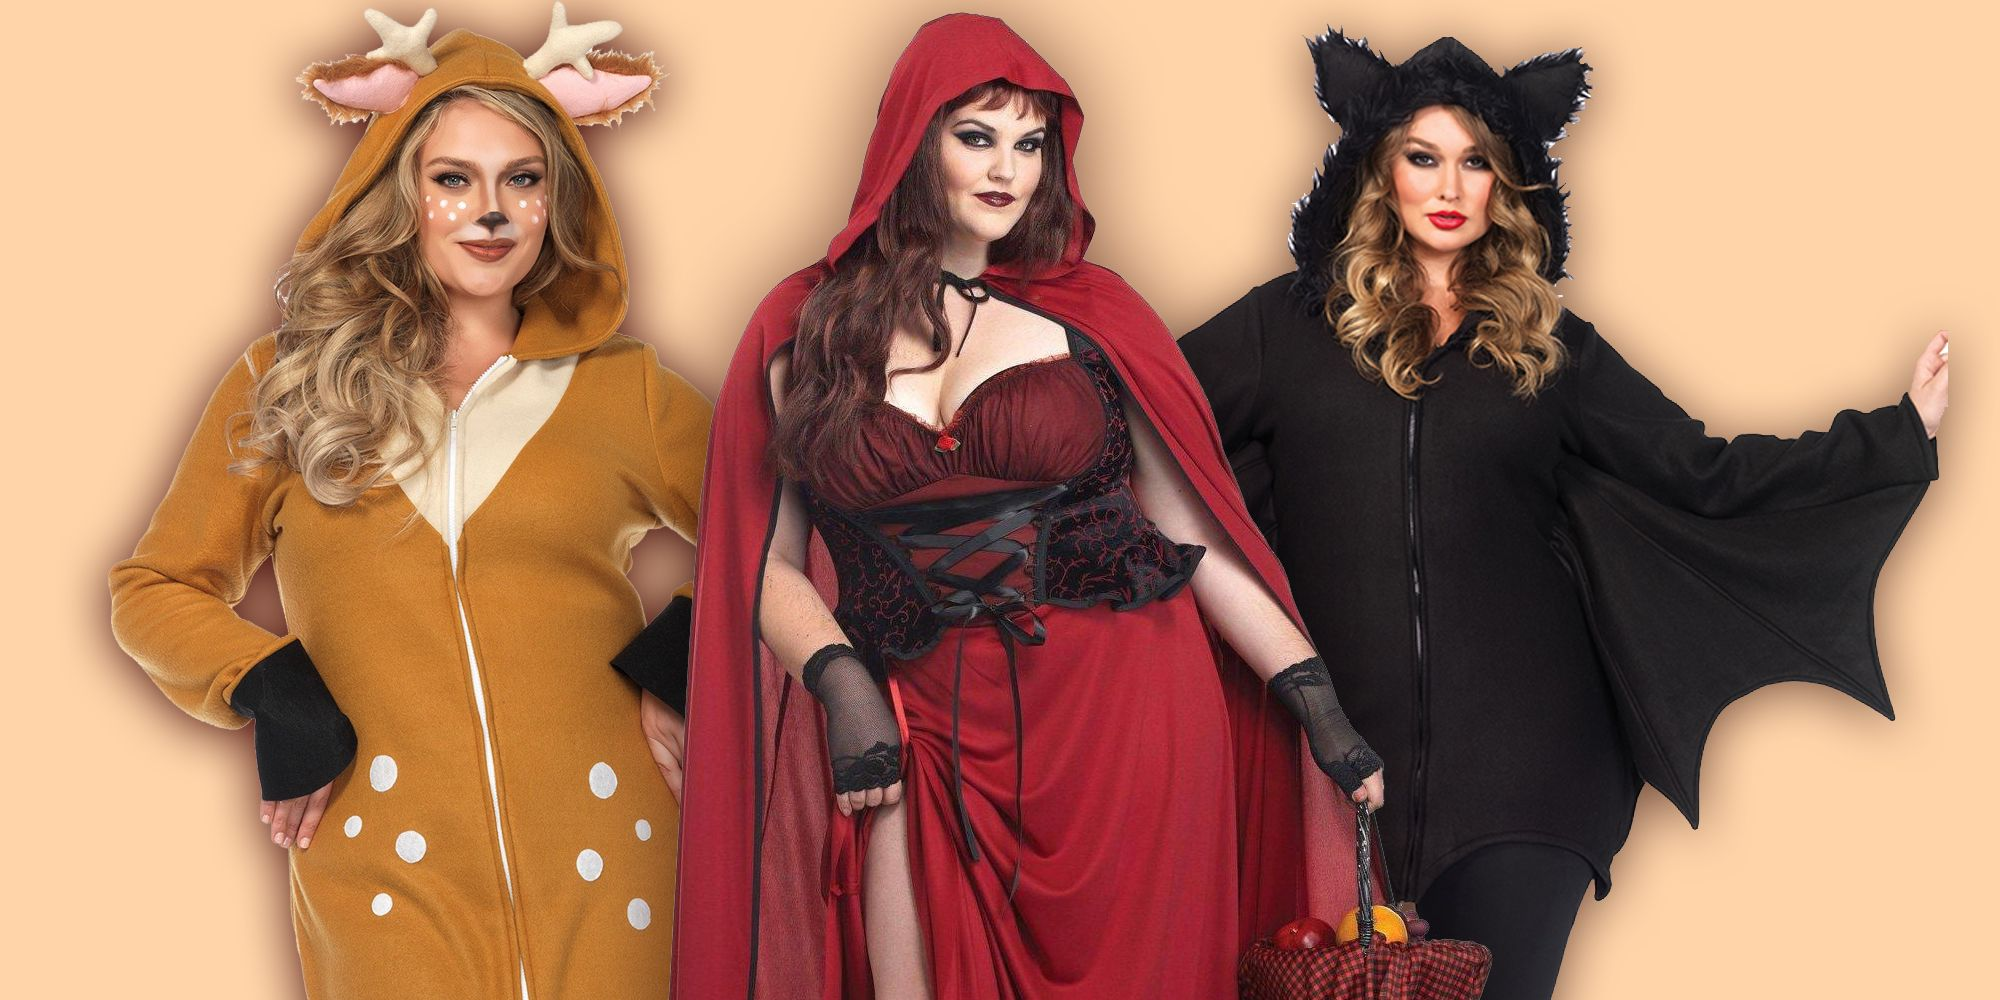 plus size halloween costumes  sc 1 st  Cosmopolitan & Plus Size Halloween Costumes 2018 - 23 of the Best Fancy Dress ...